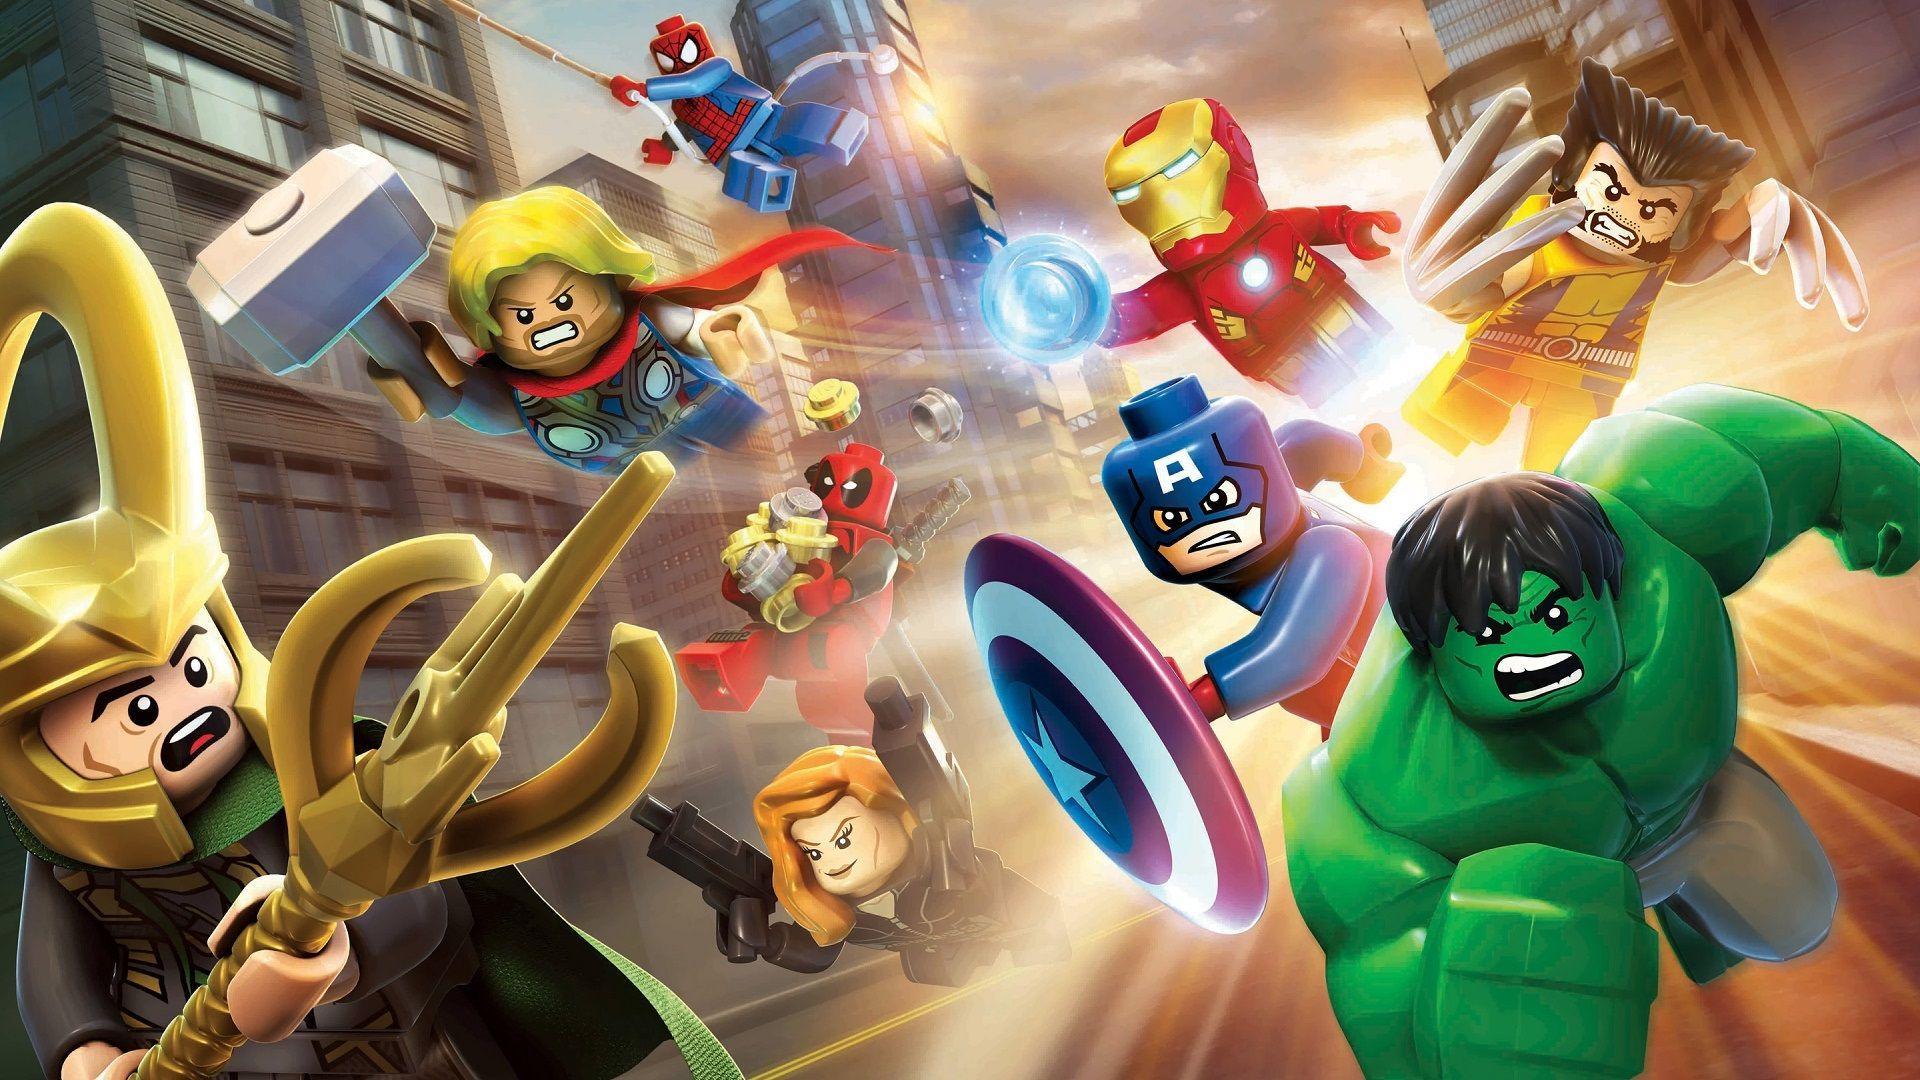 LEGO Marvel Vs  DC Wallpapers - Top Free LEGO Marvel Vs  DC